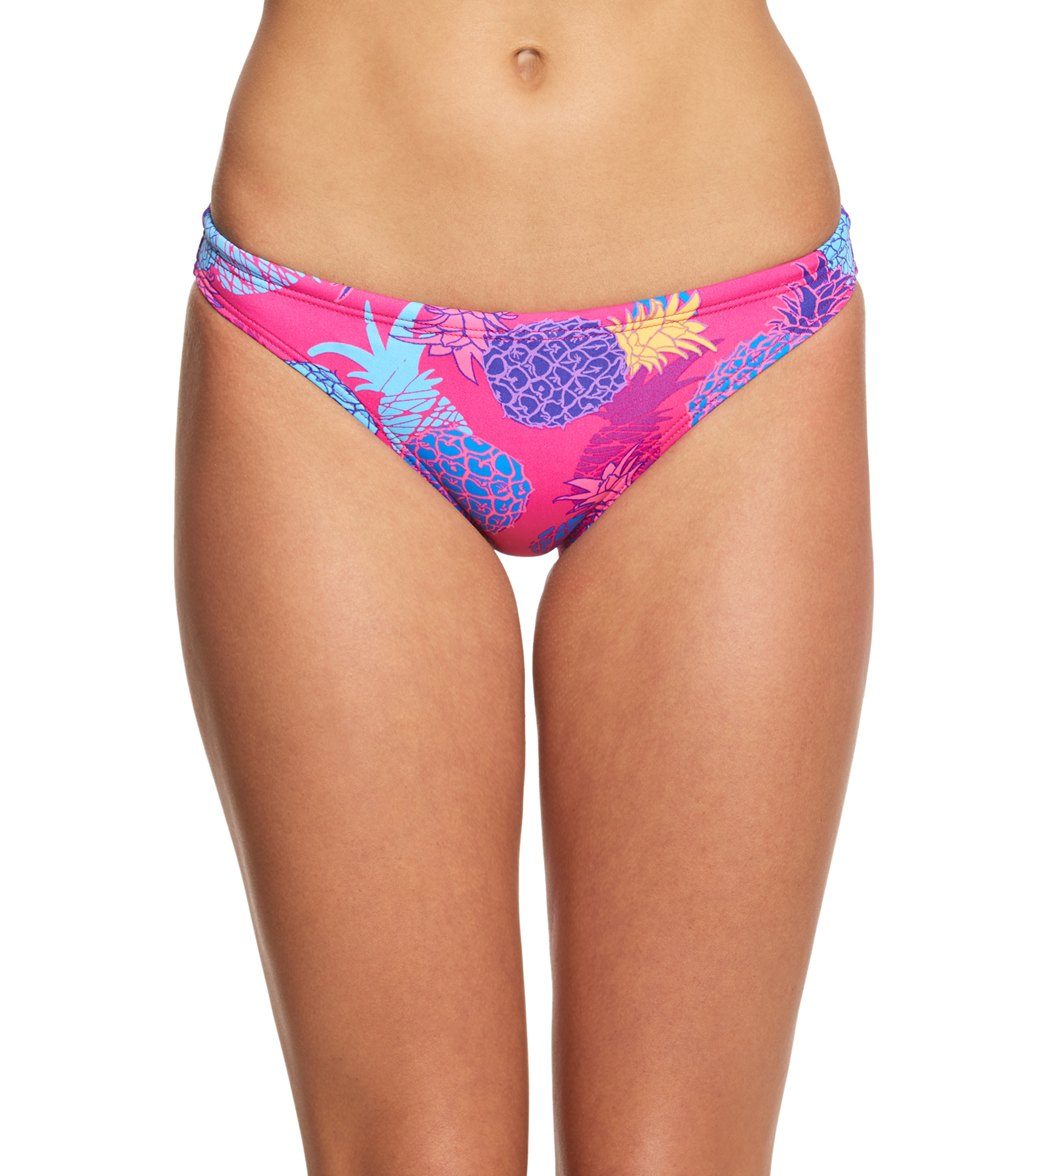 375d296822139 TYR Women s Panama Bikini Swimsuit Bottom at SwimOutlet.com